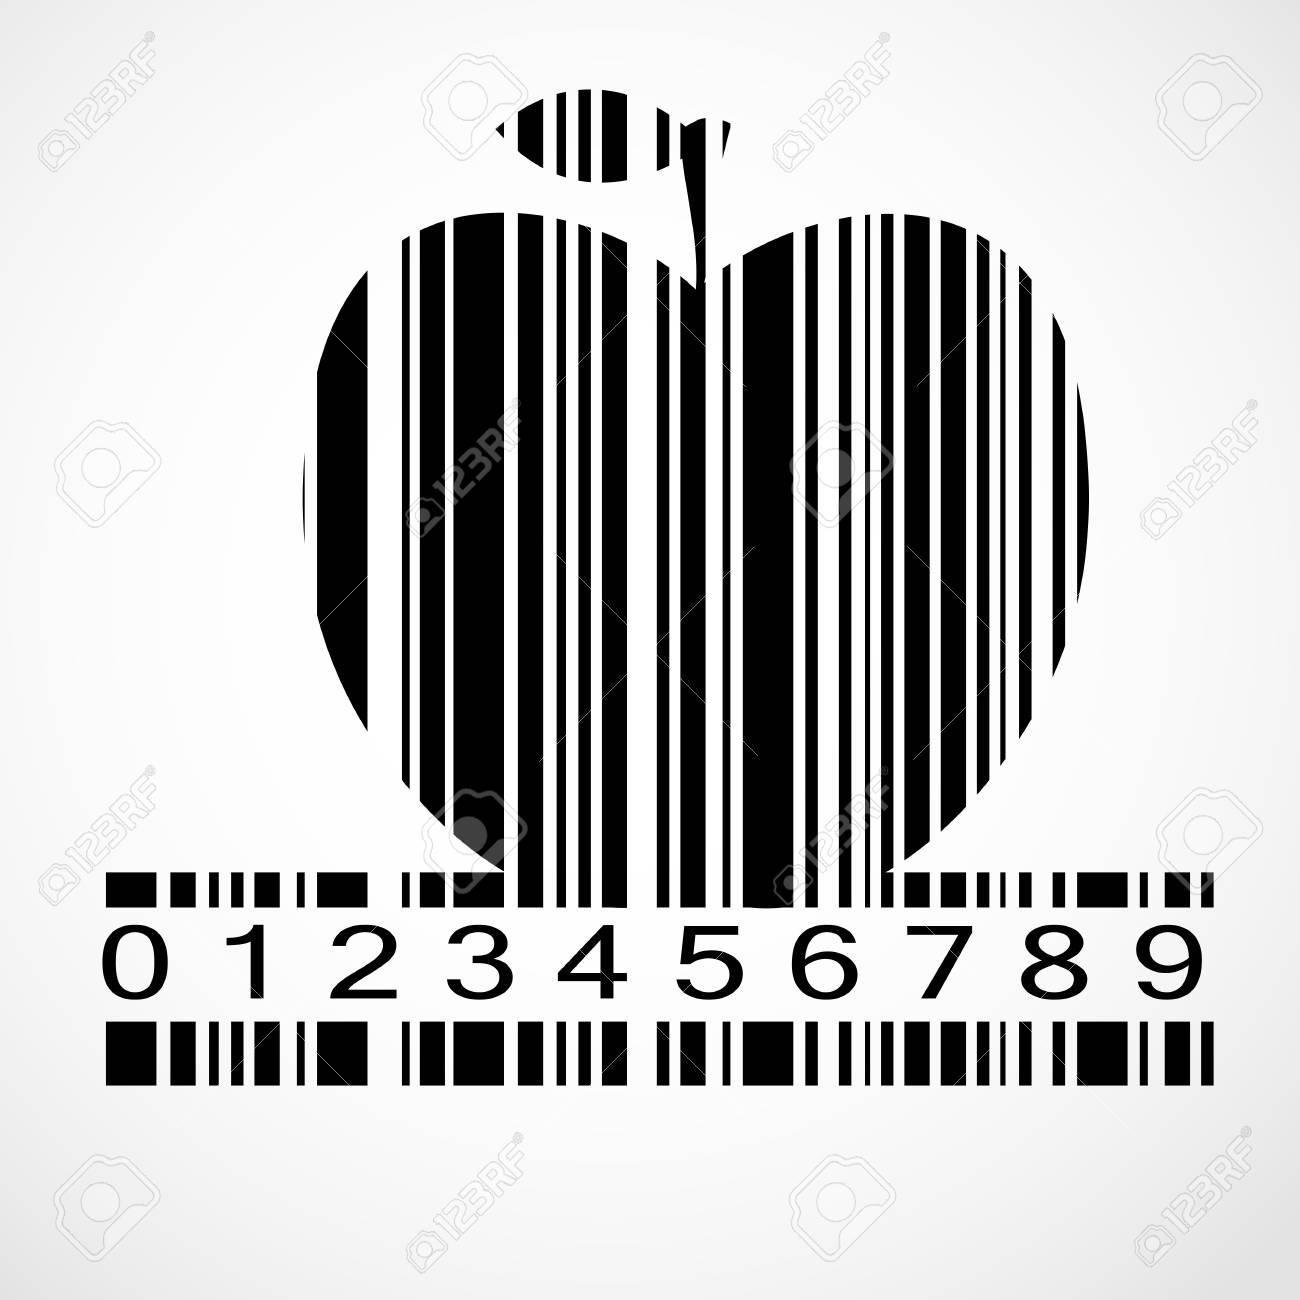 black barcode apple image vector illustration eps10 royalty free